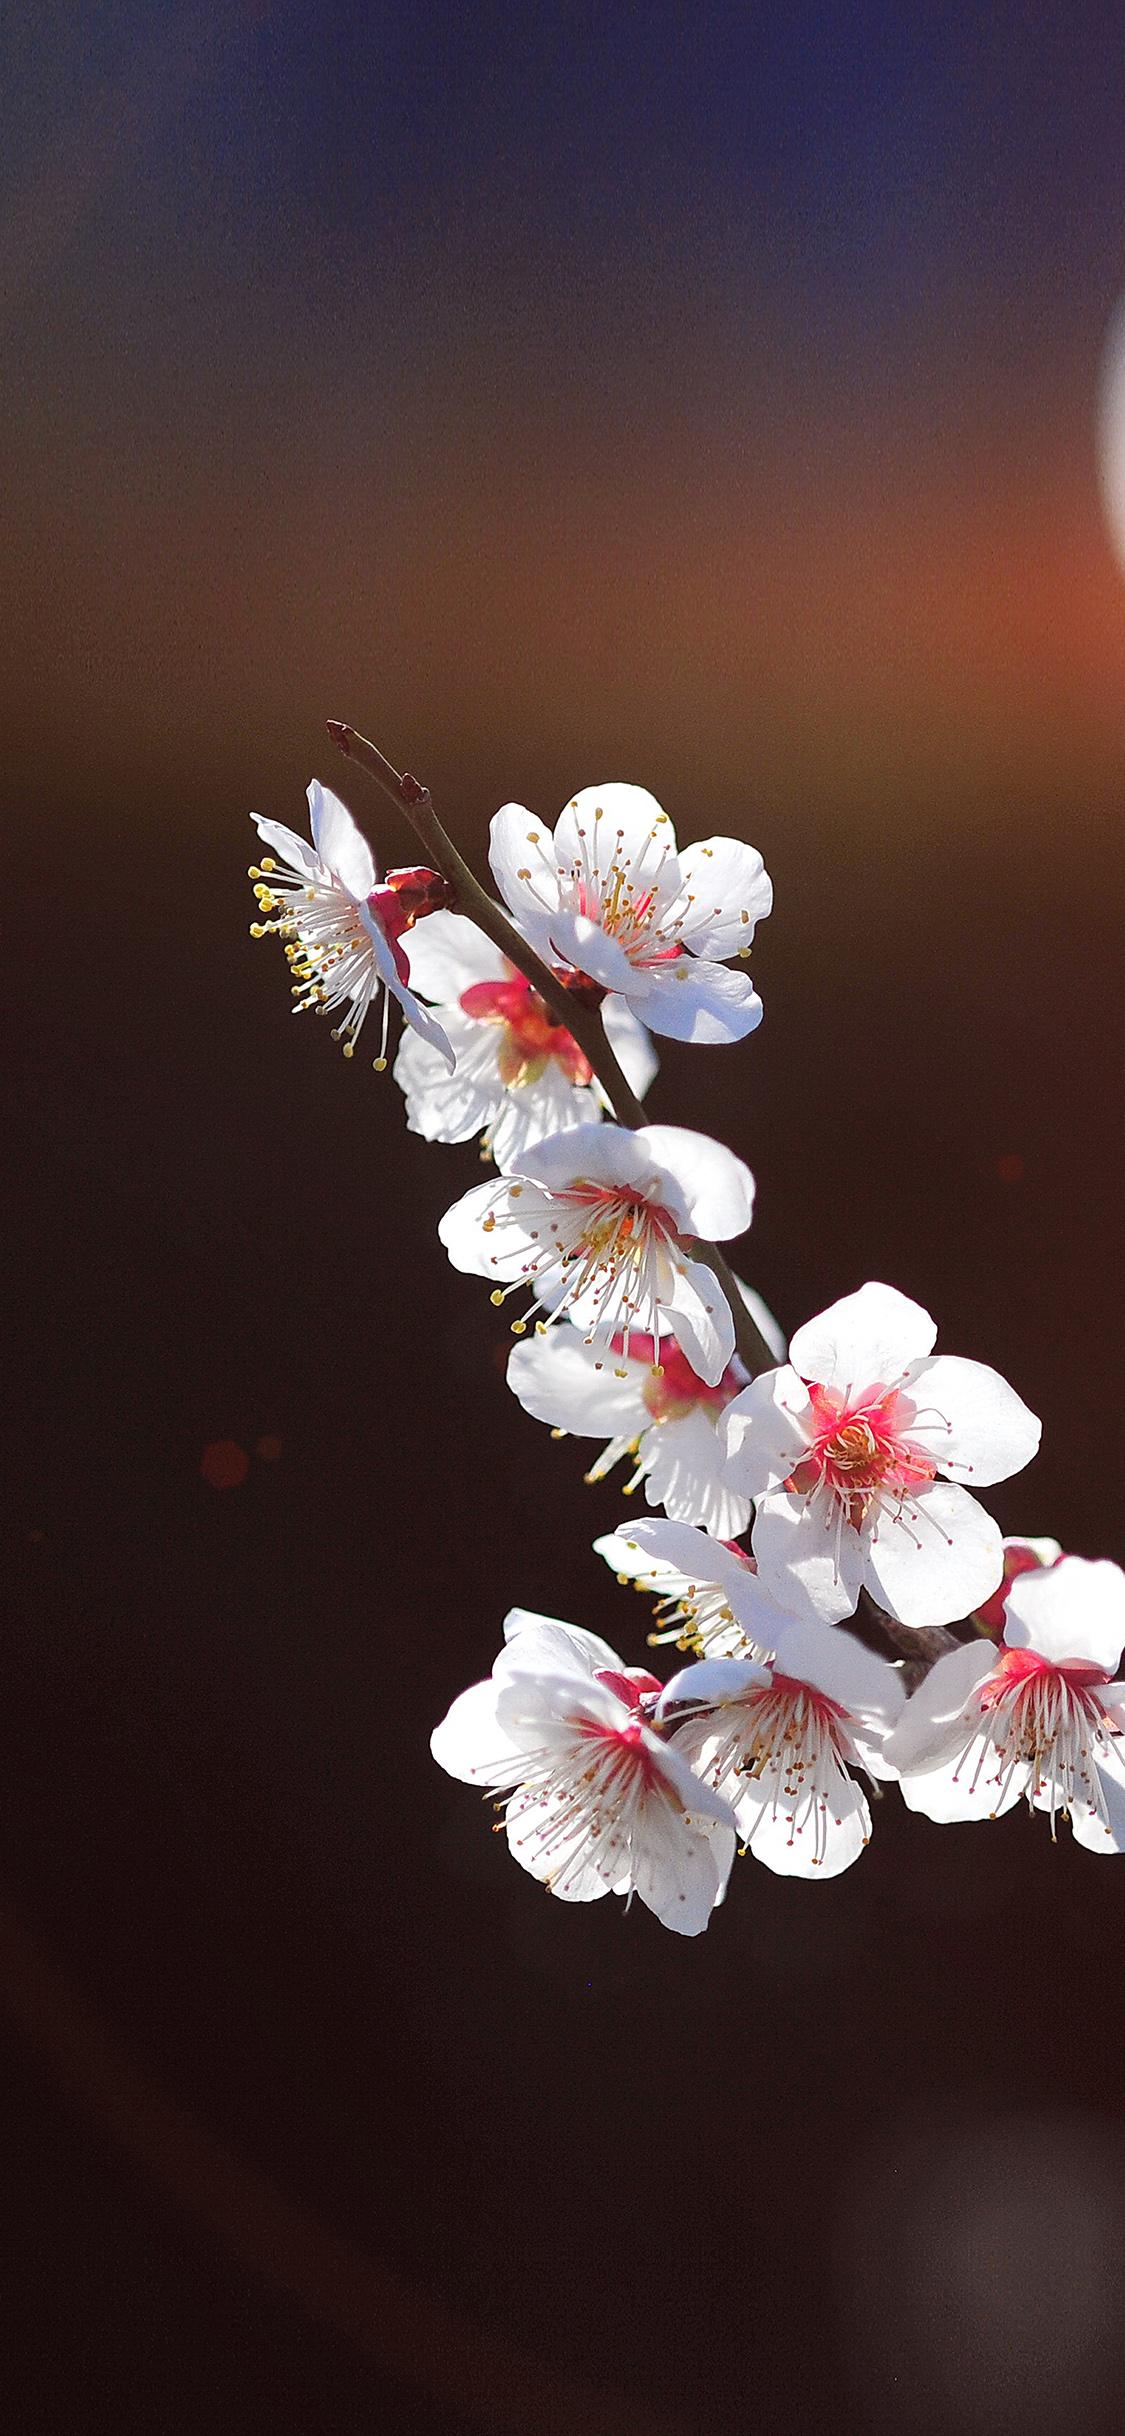 iPhonexpapers.com-Apple-iPhone-wallpaper-mq23-spring-flower-sakura-nature-tree-flare